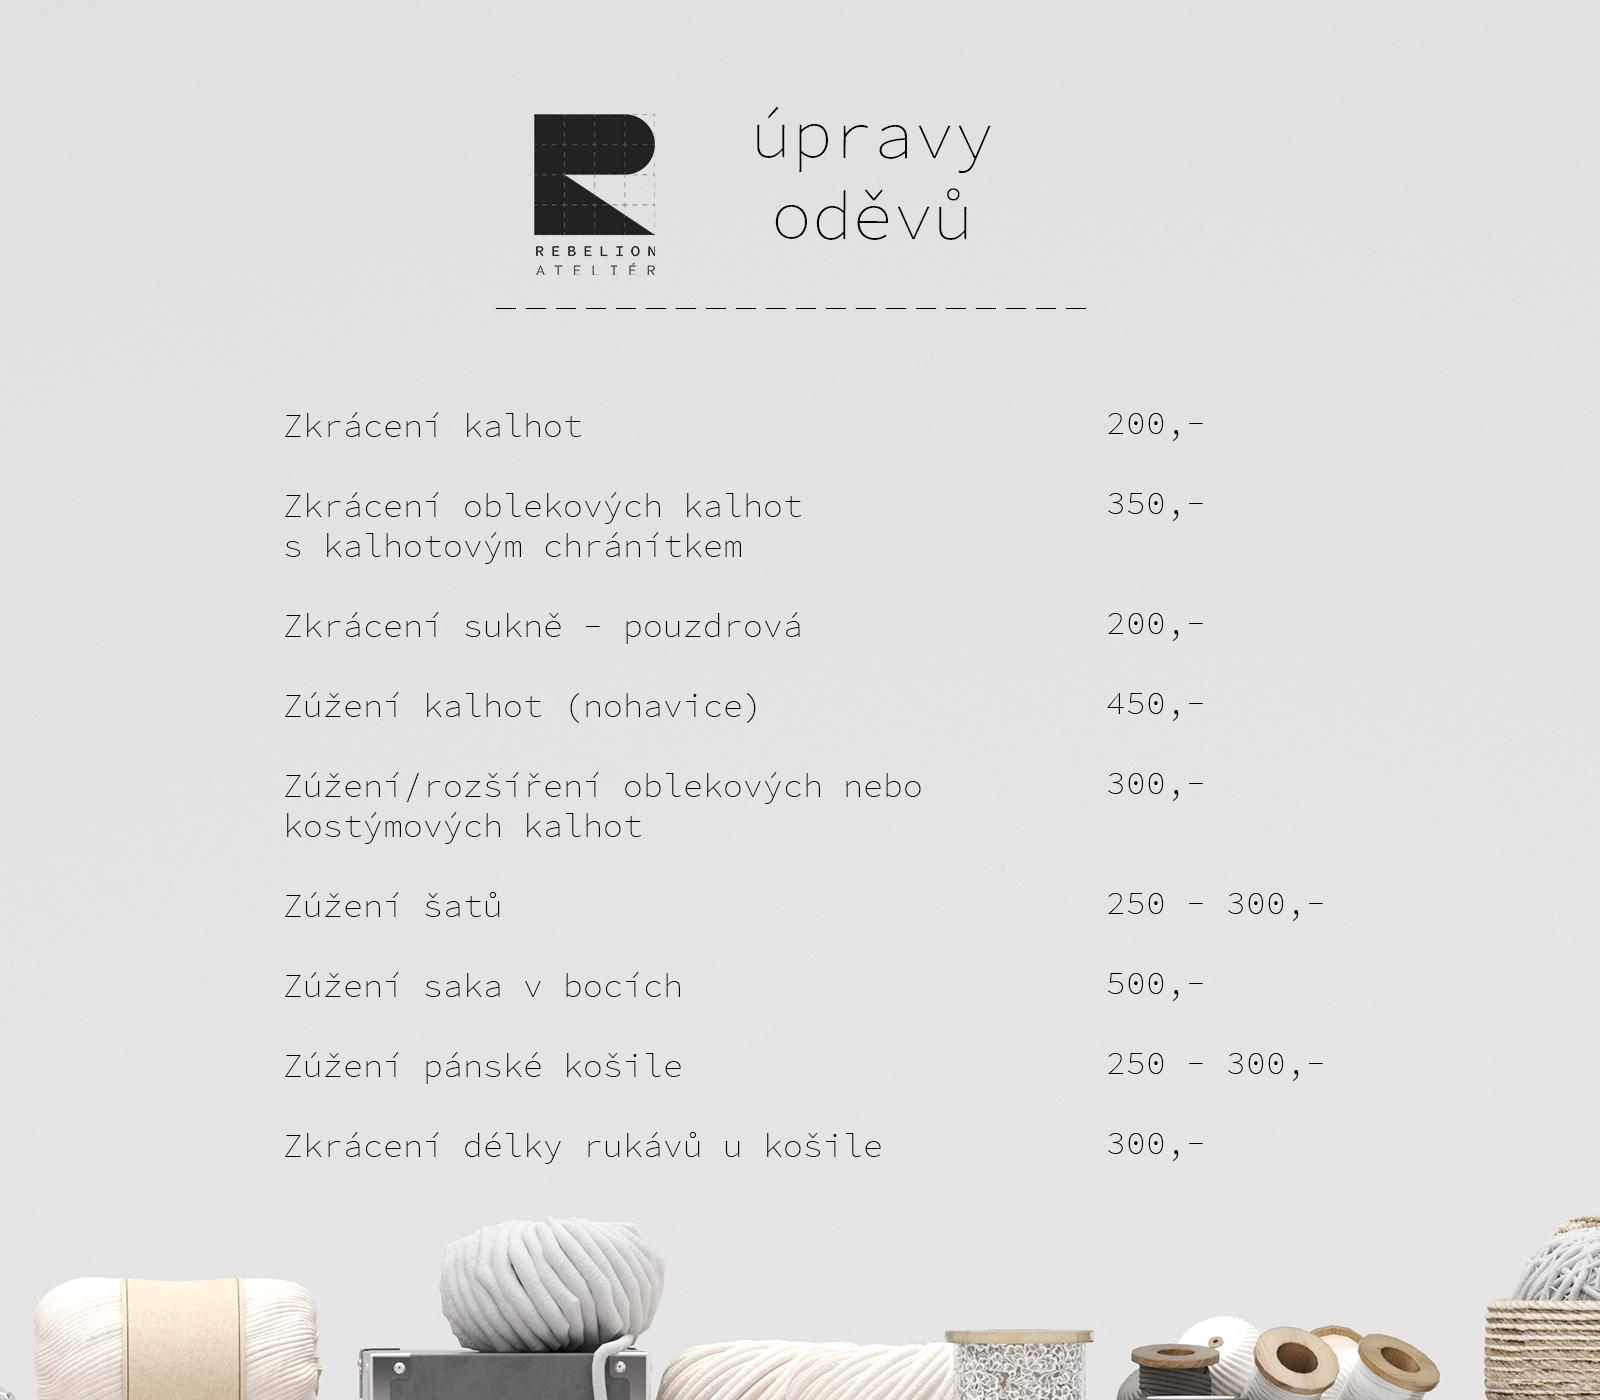 upravy_odevu_rebelion_atelier